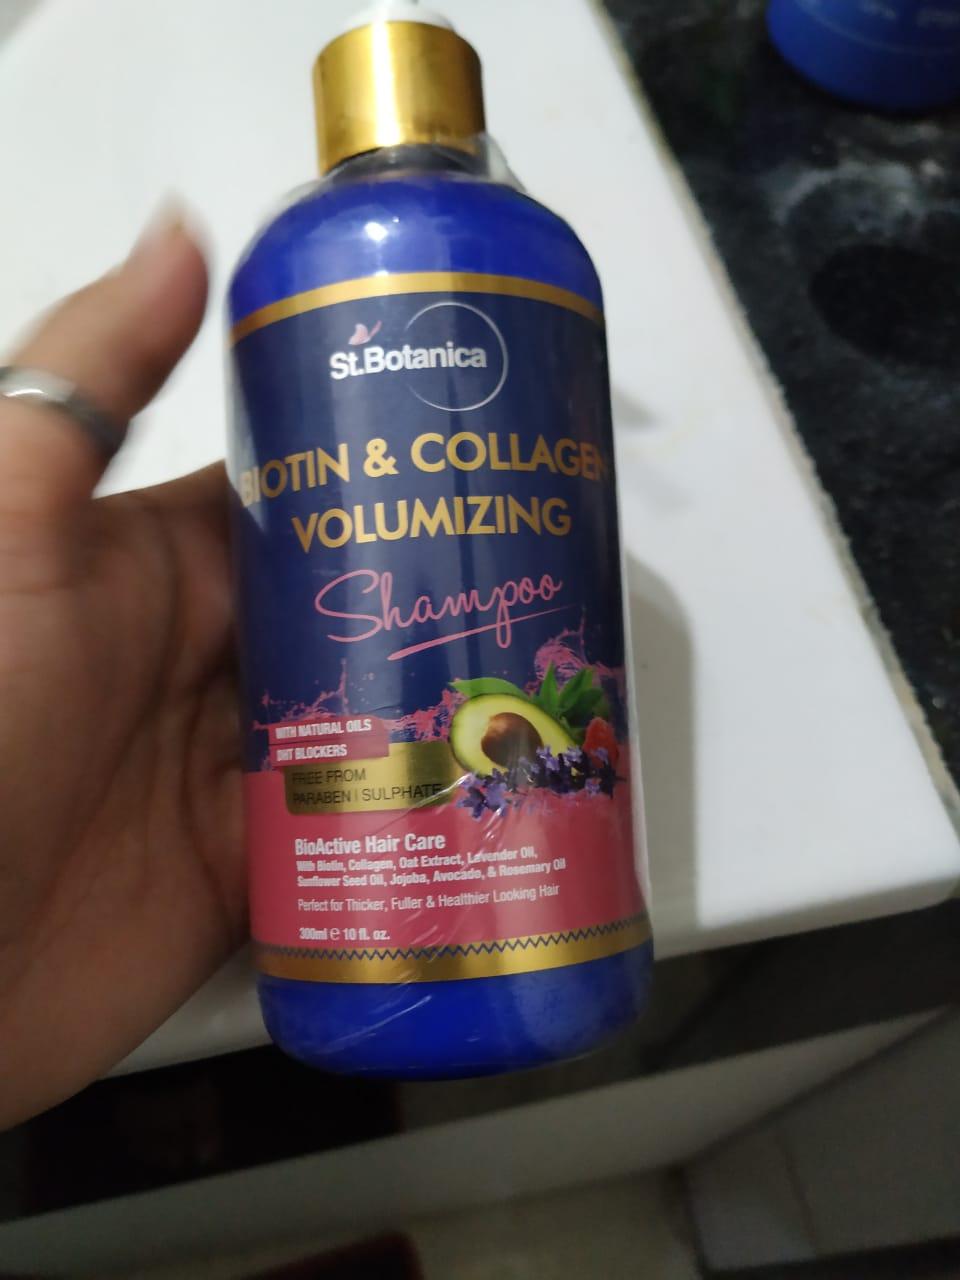 St.Botanica Biotin & Collagen Volumizing Hair Shampoo-Good Shampoo for instant voluminous and bouncy hair…-By rita_punjabi